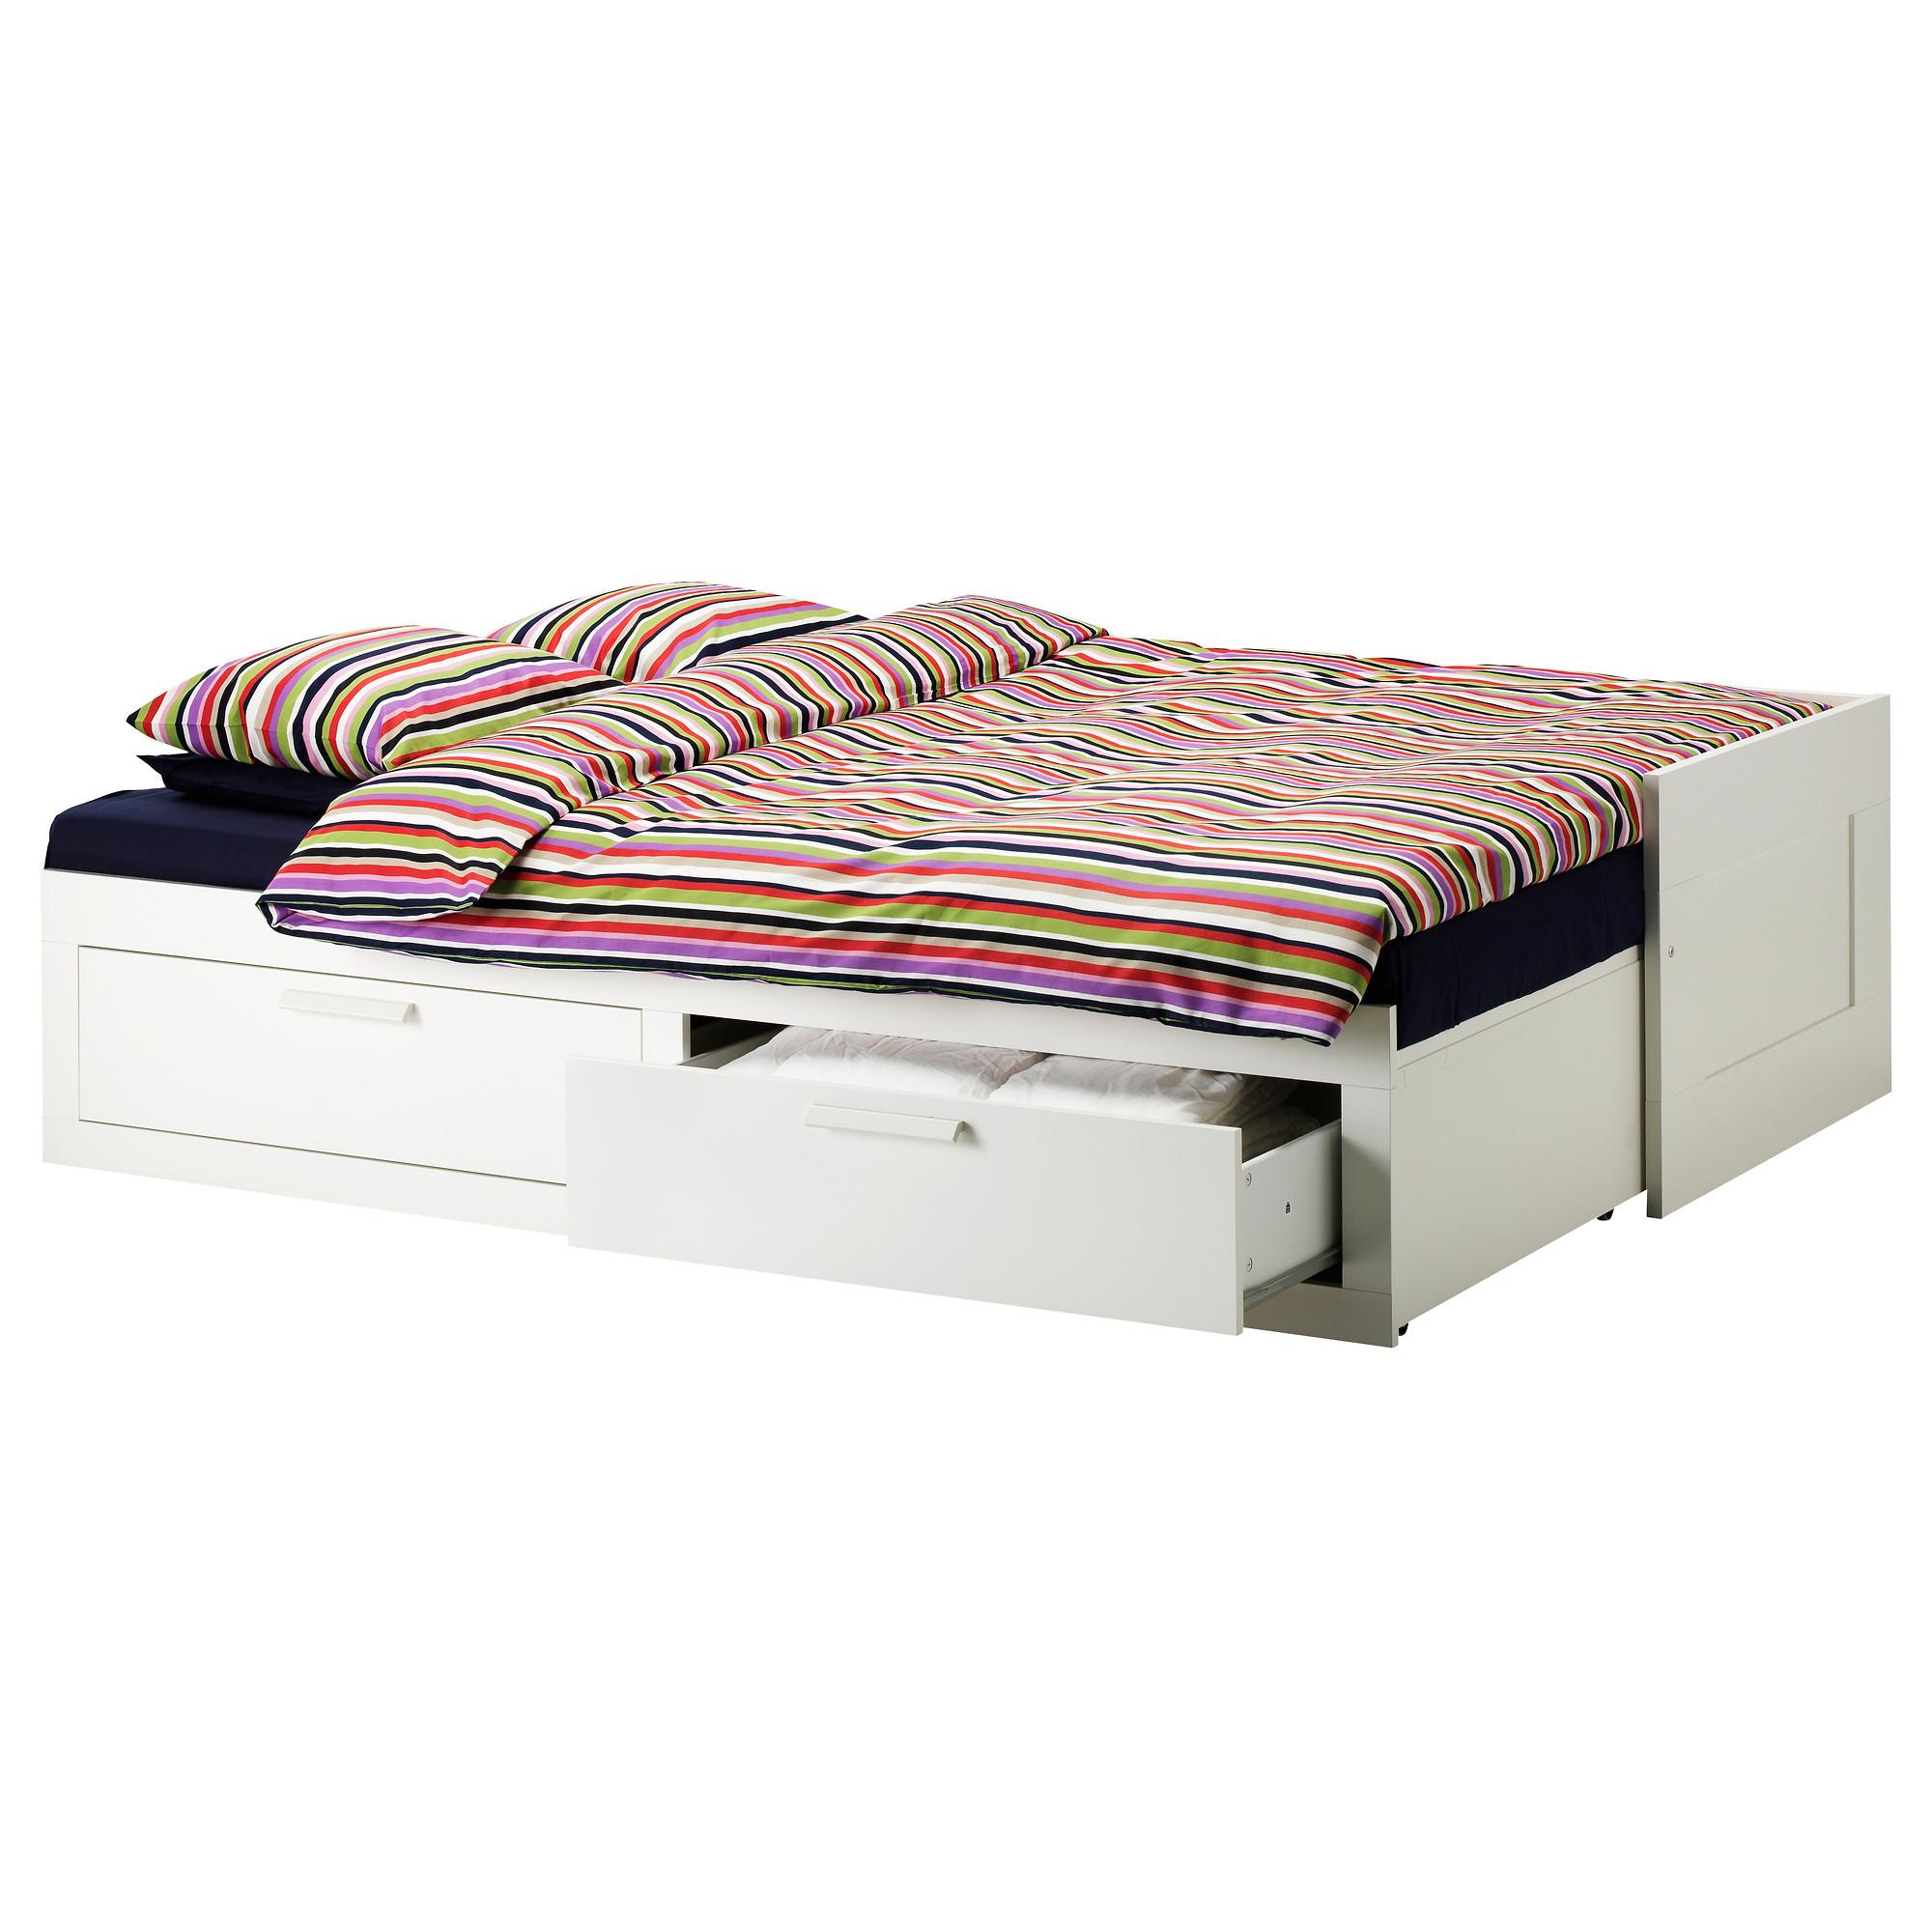 Ikea Tagesbett Brimnes : the comfortable and beautiful designs of ikea bed frame ~ Watch28wear.com Haus und Dekorationen